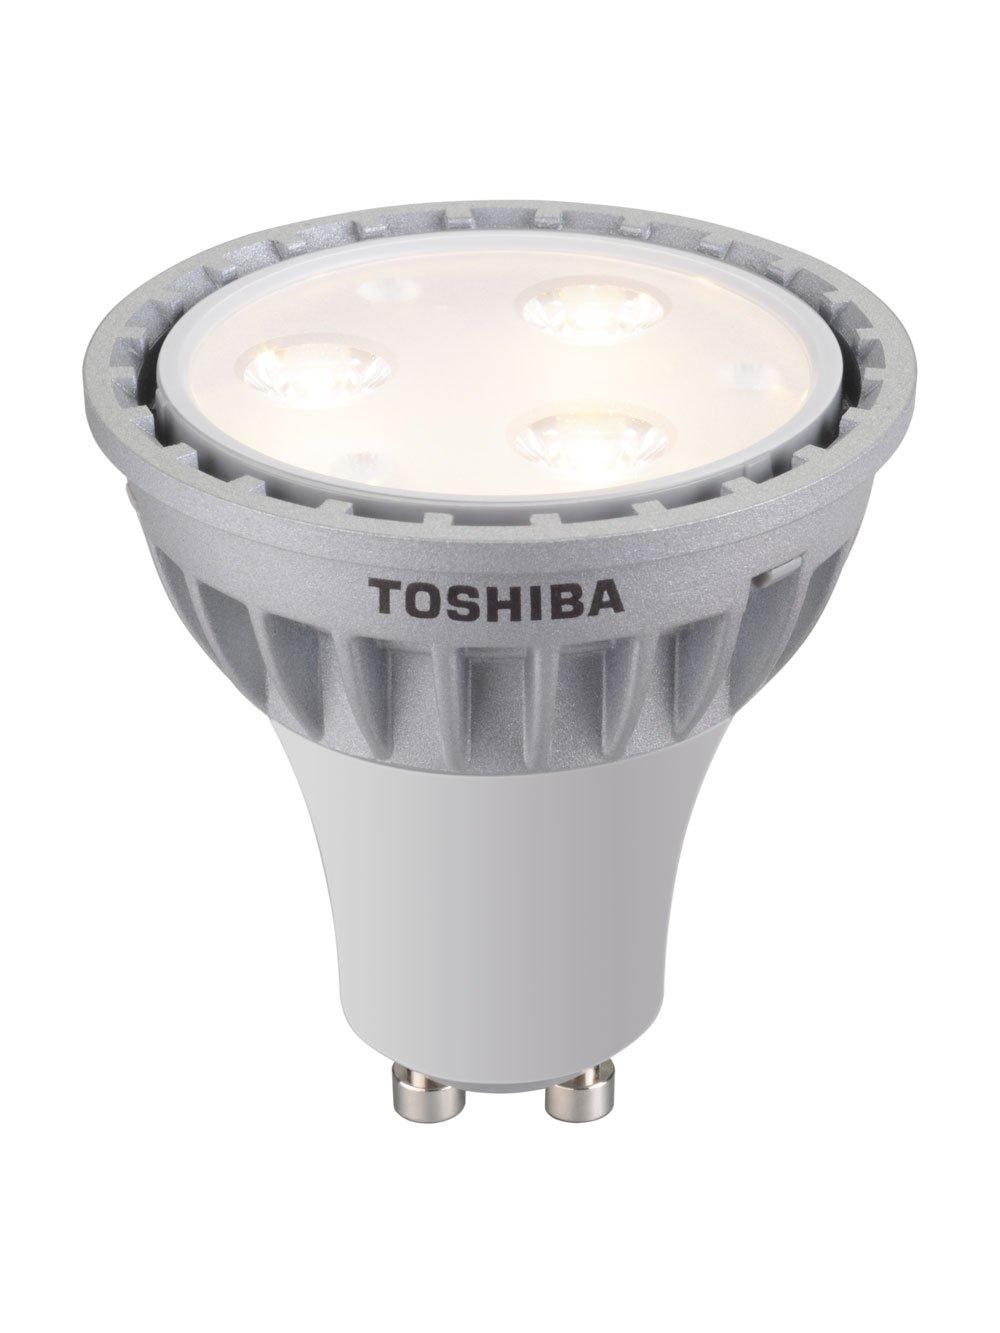 Toshiba ldrc0627wu1eud2 led spot gu10 71 w 2700k warmwei 40 toshiba ldrc0627wu1eud2 led spot gu10 71 w 2700k warmwei 40 40000 stunden 640cd 355 lumen amazon beleuchtung parisarafo Gallery